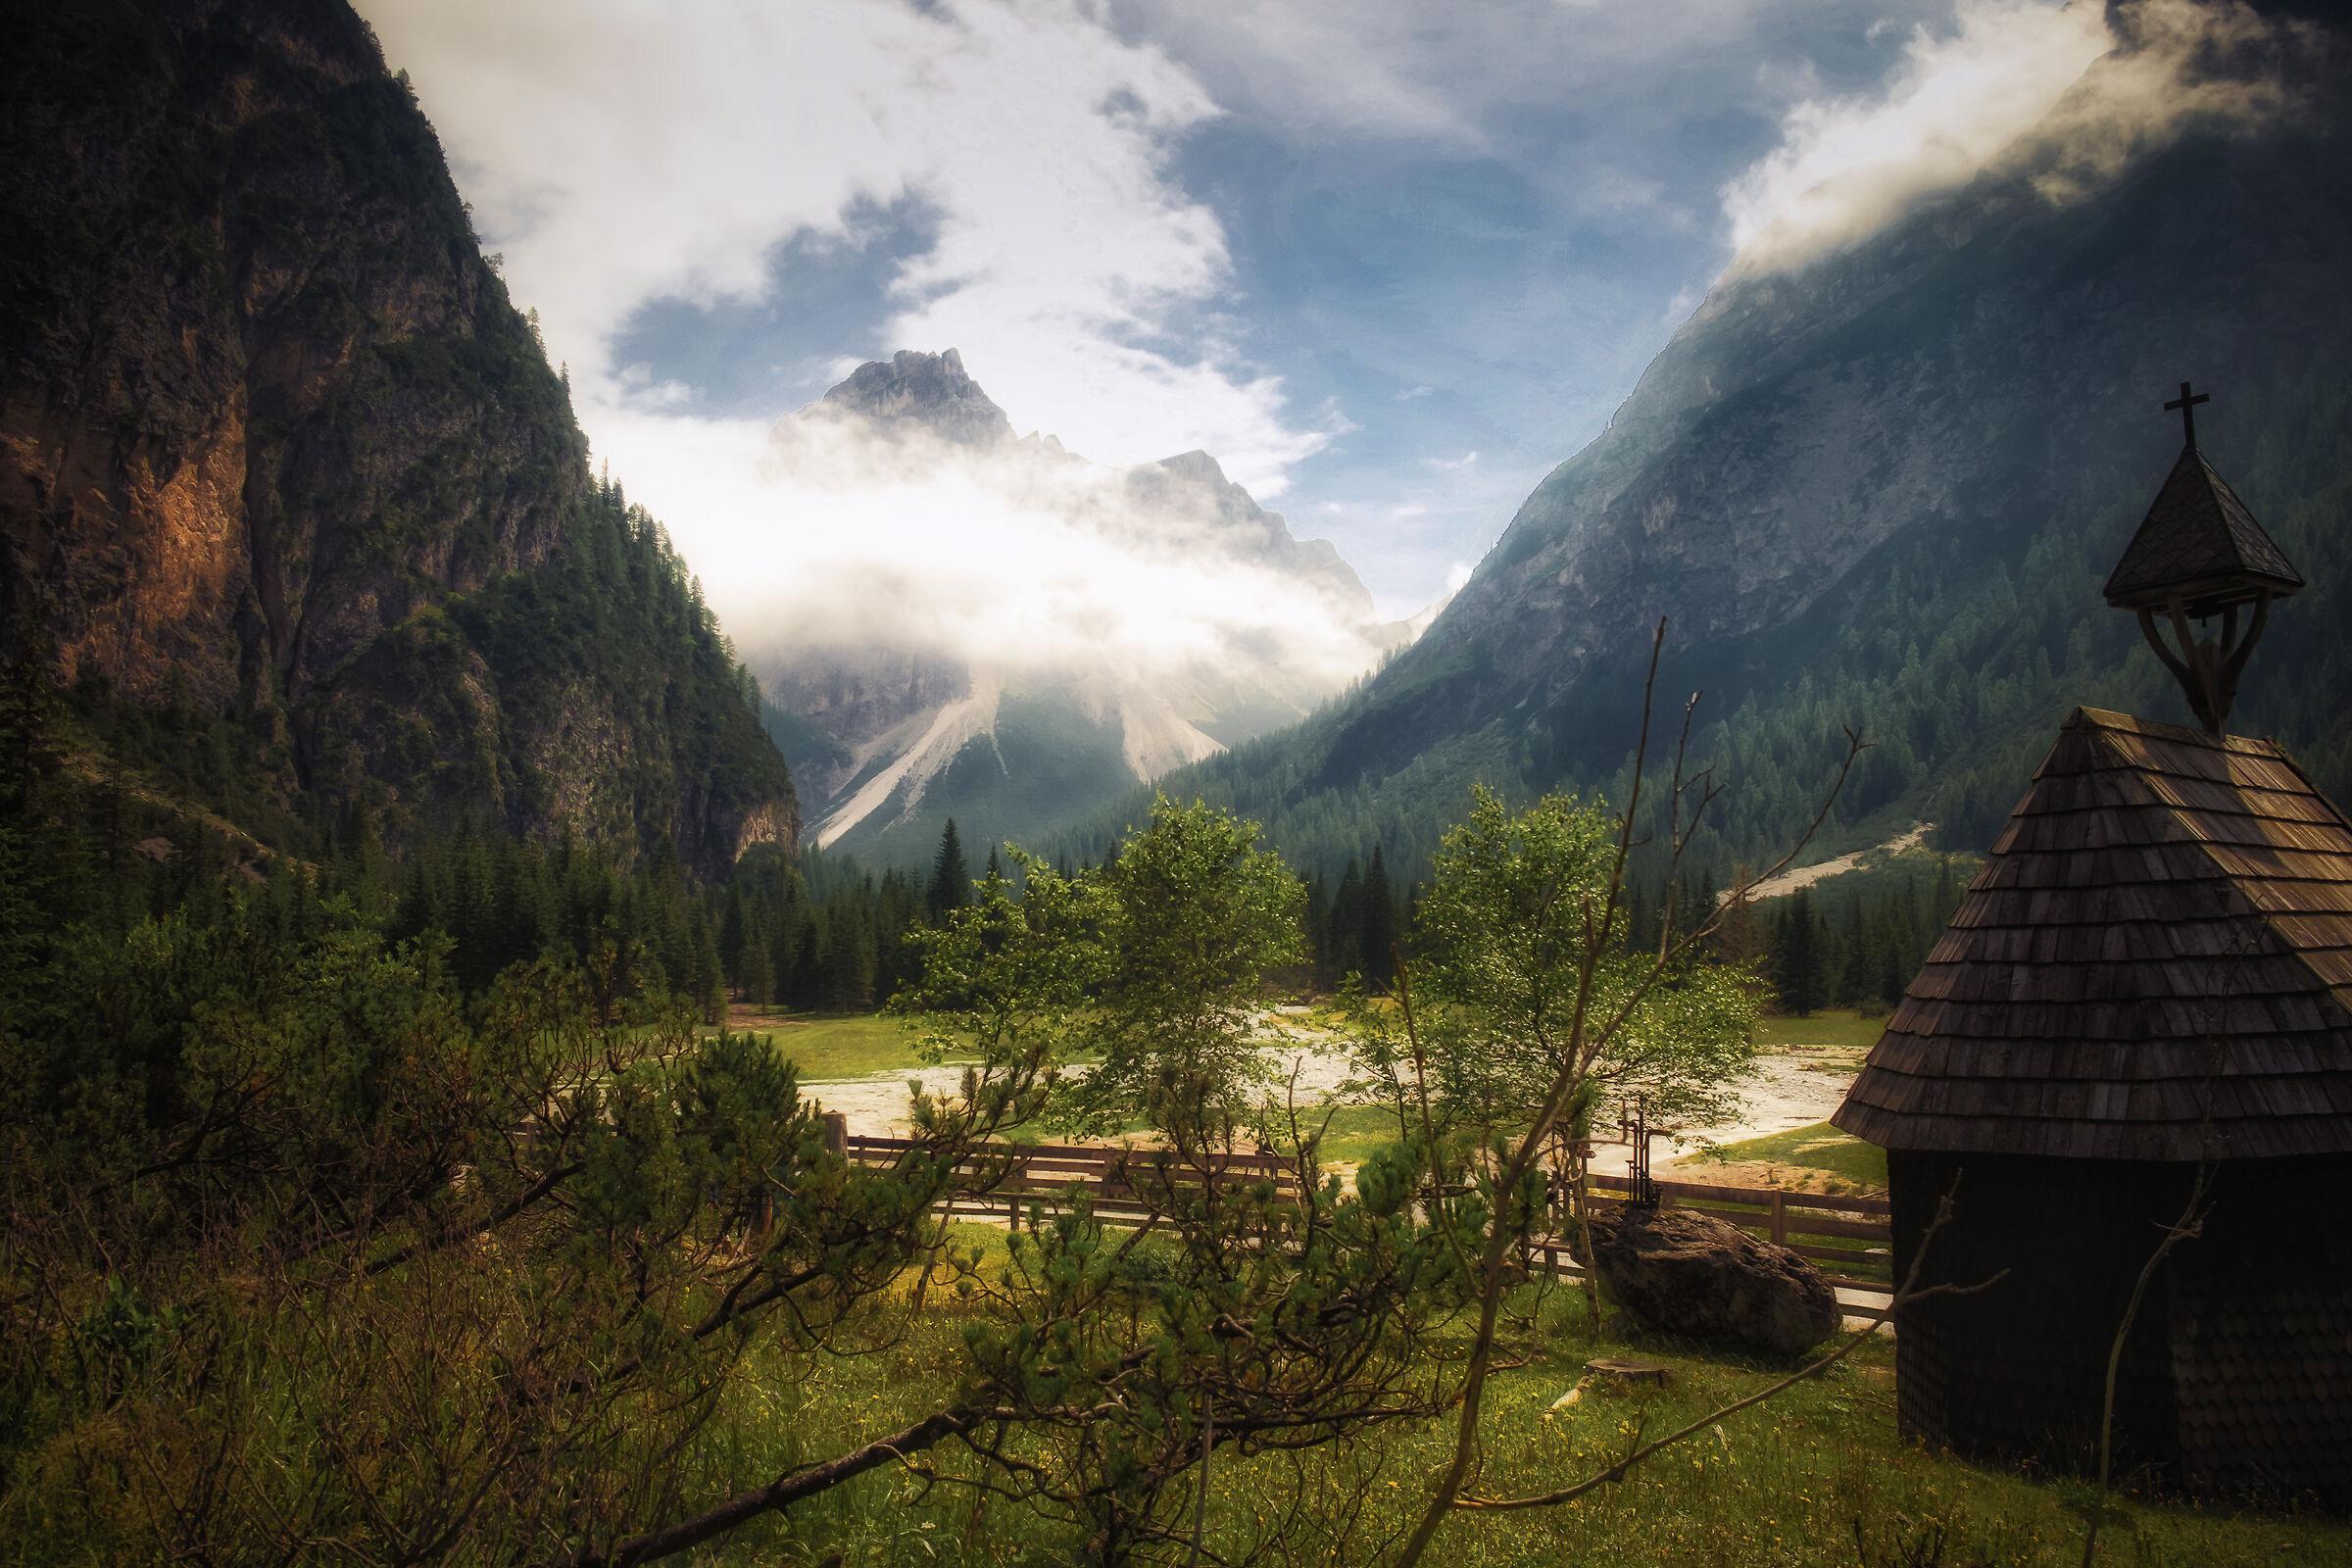 Magical Dolomites...